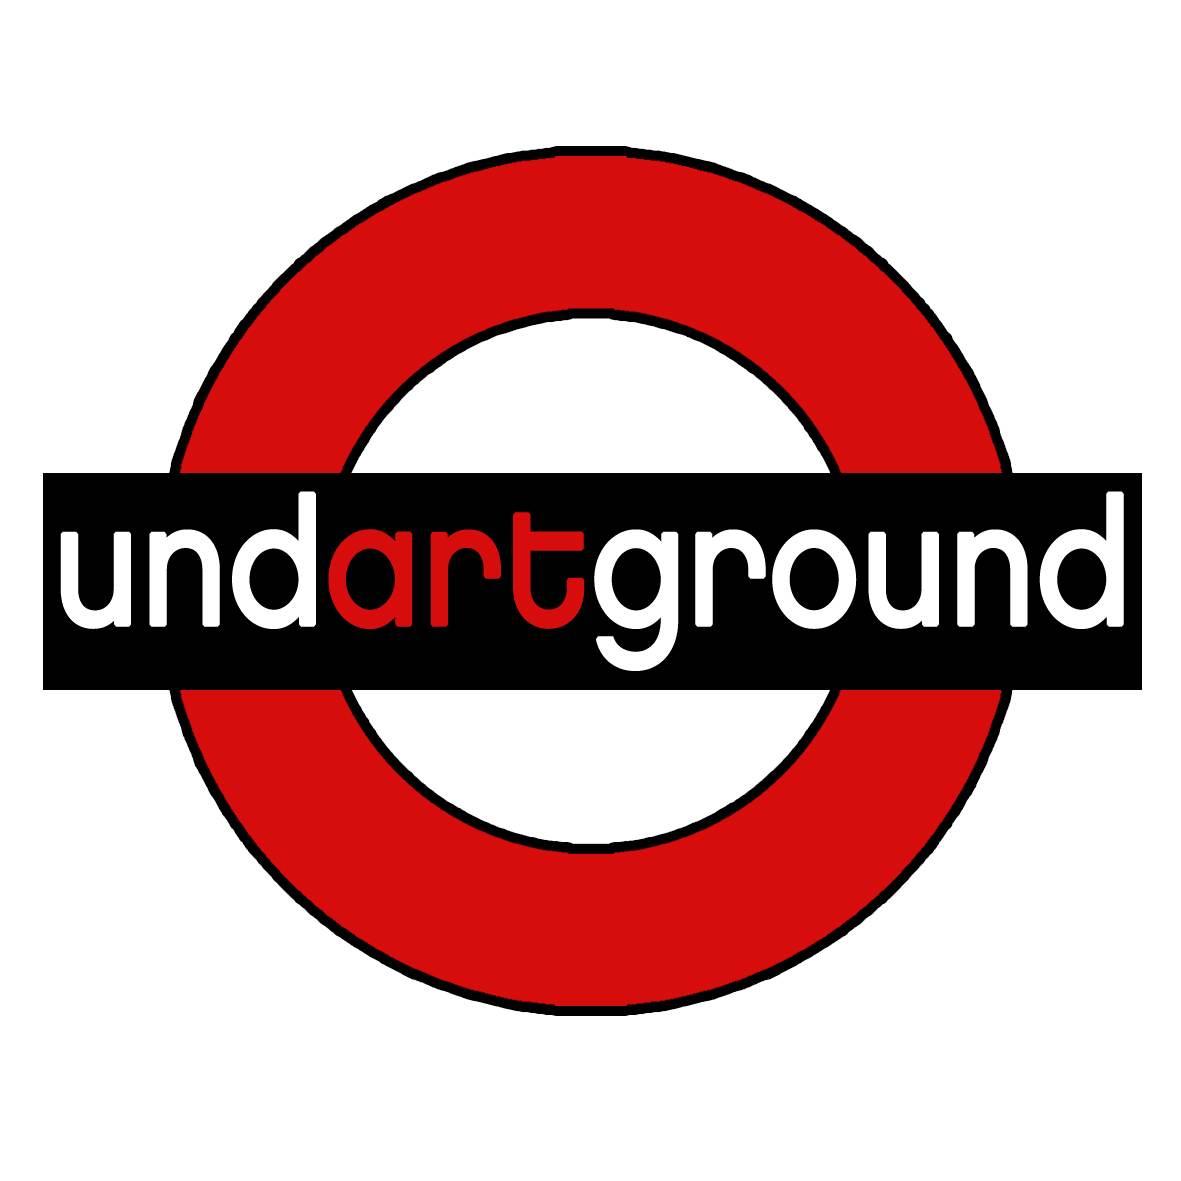 undarground logotype